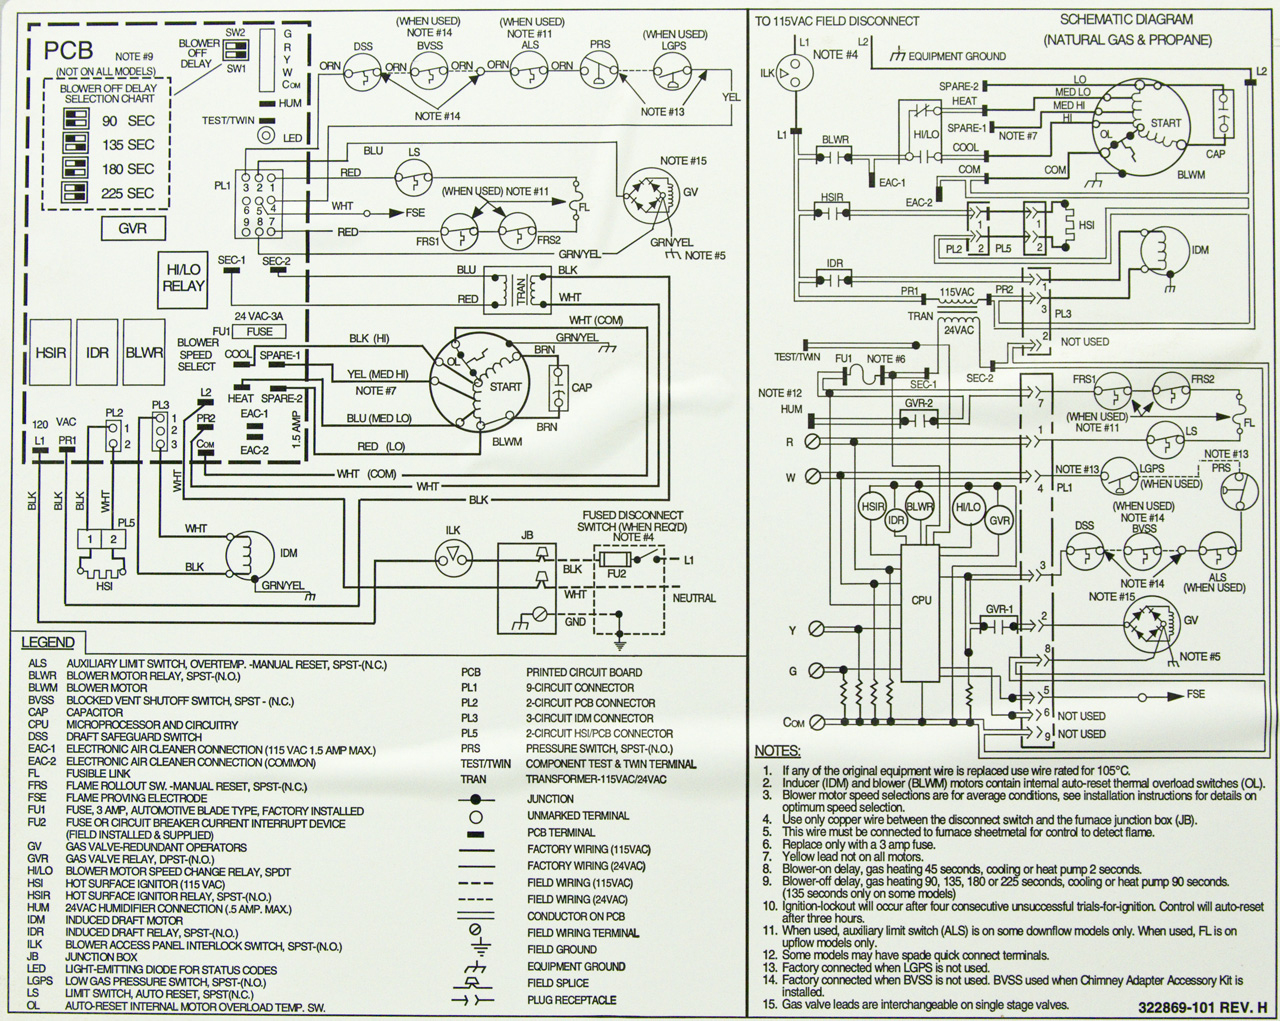 Carrier Heater Wiring Diagram | Manual E-Books - Carrier Wiring Diagram